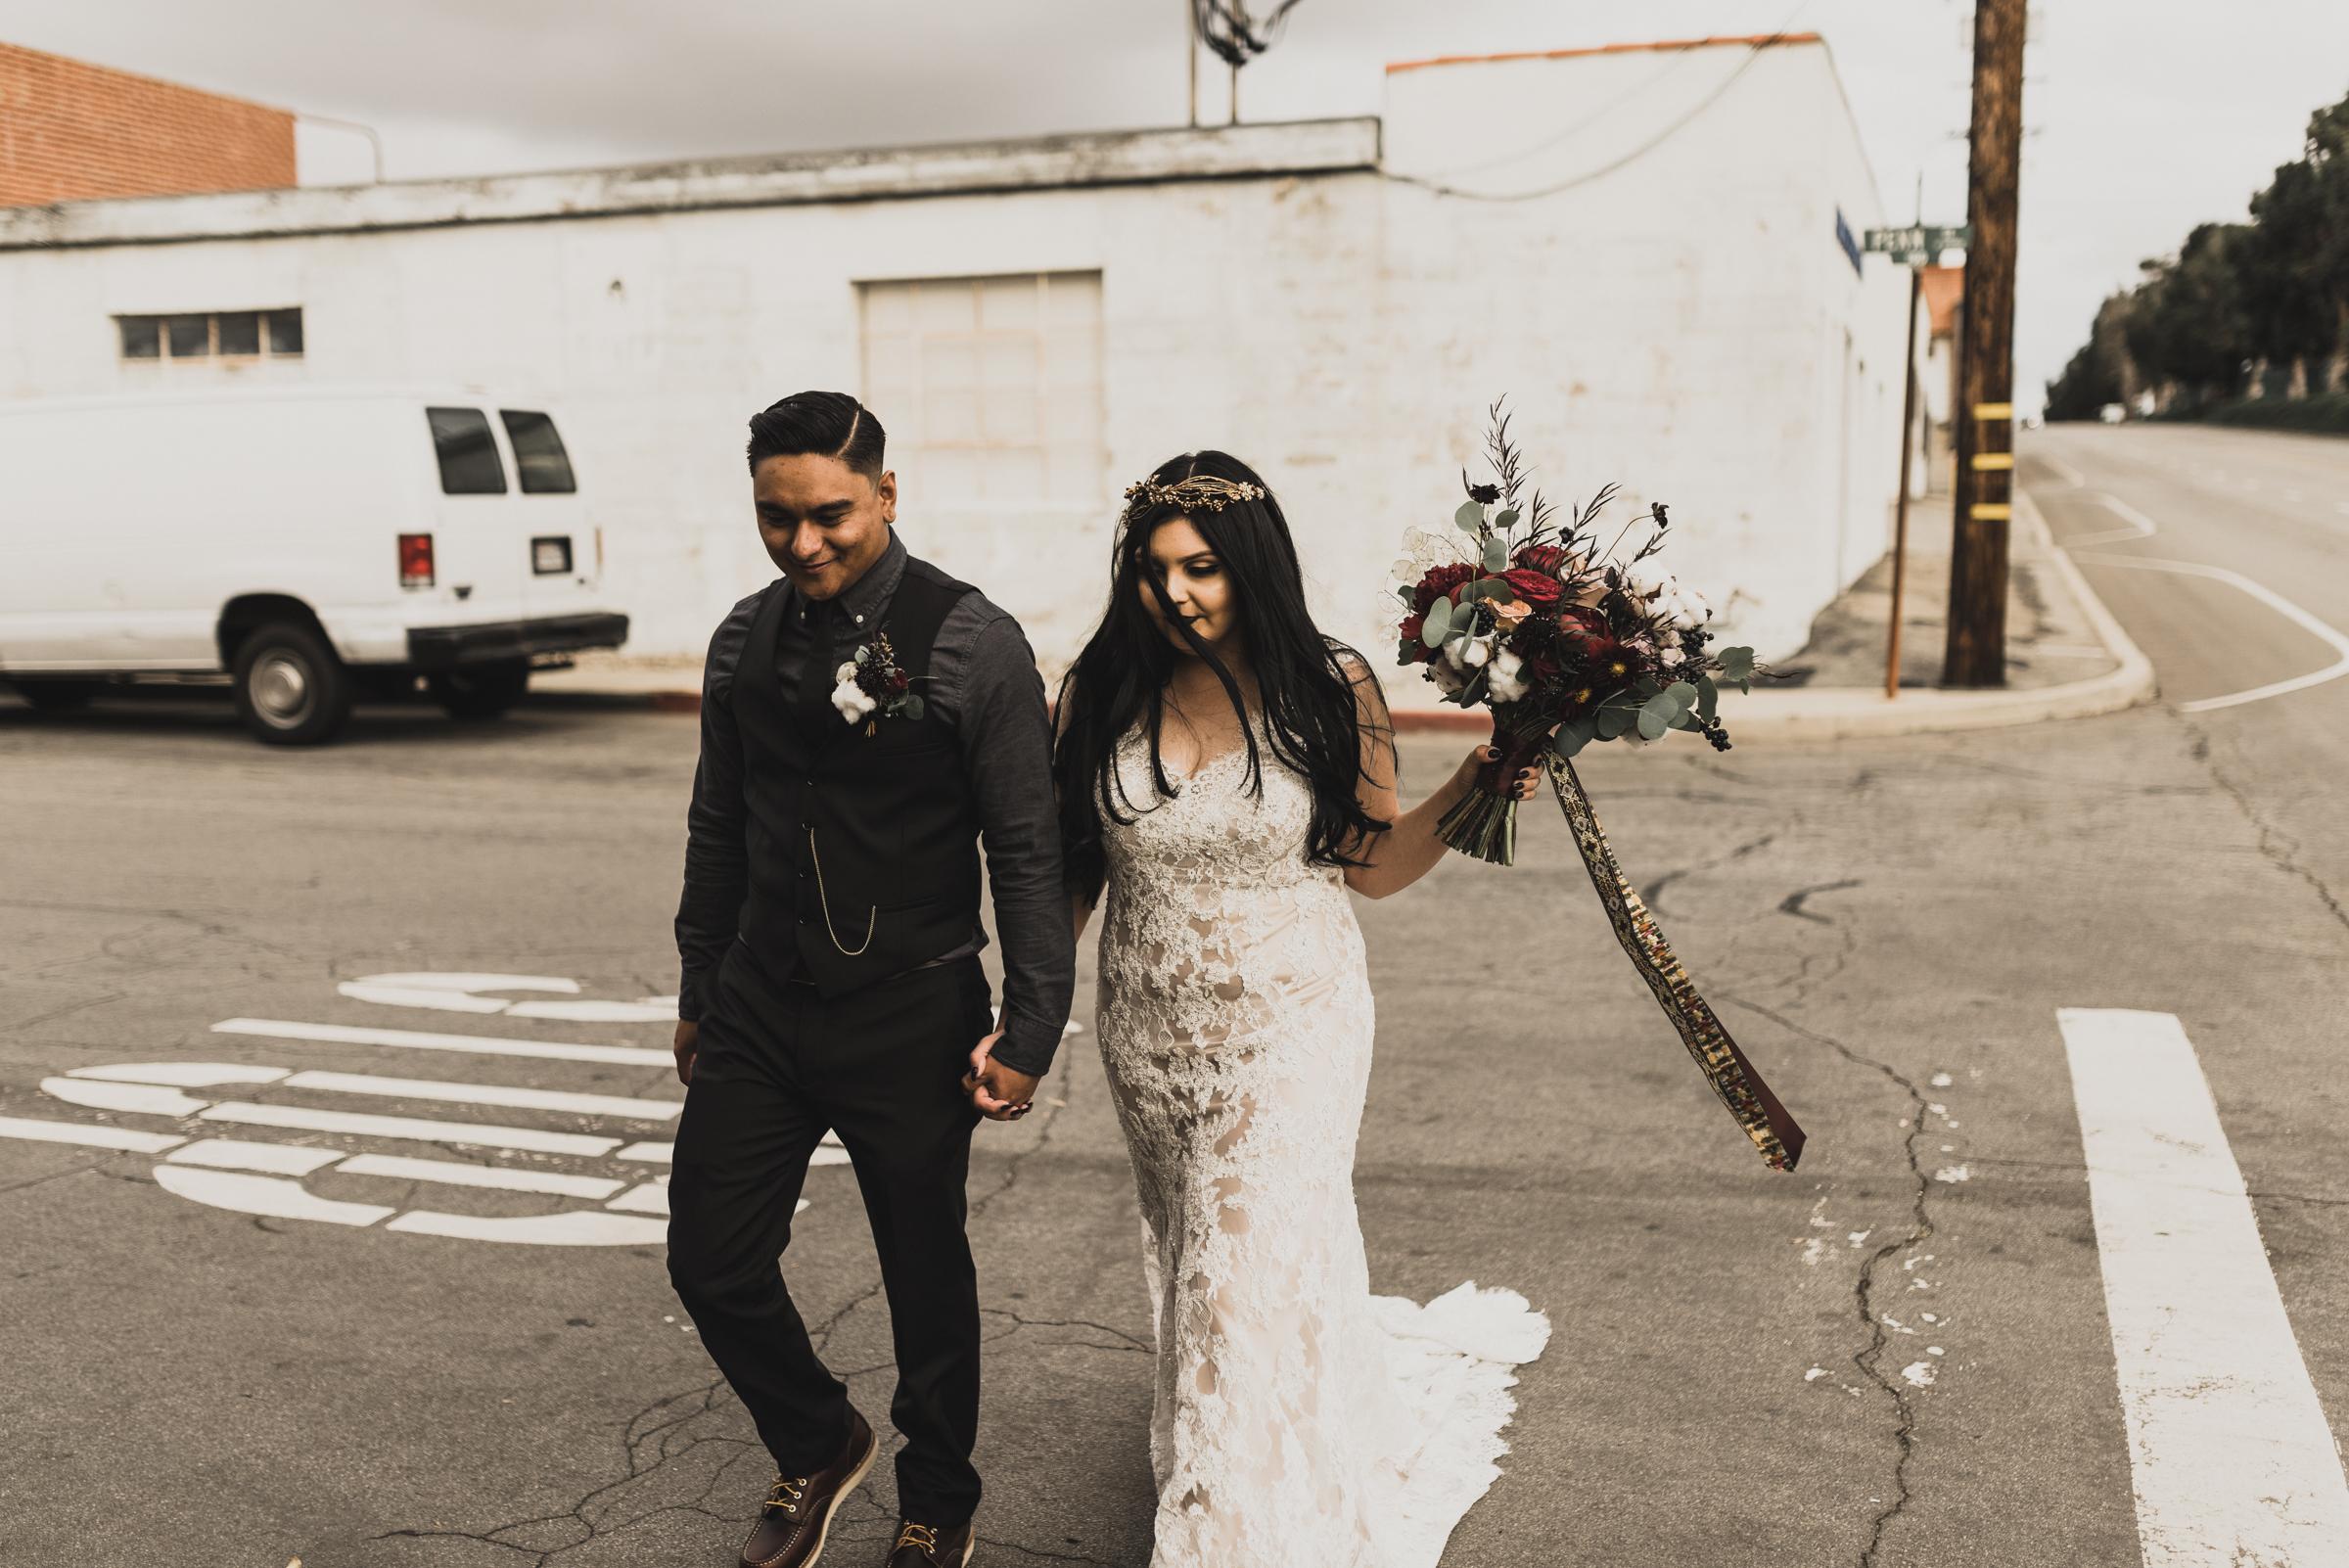 ©Isaiah + Taylor Photography - Smoky Hollow Studios Wedding, El Segundo, Los Angeles Wedding Photographer-95.jpg